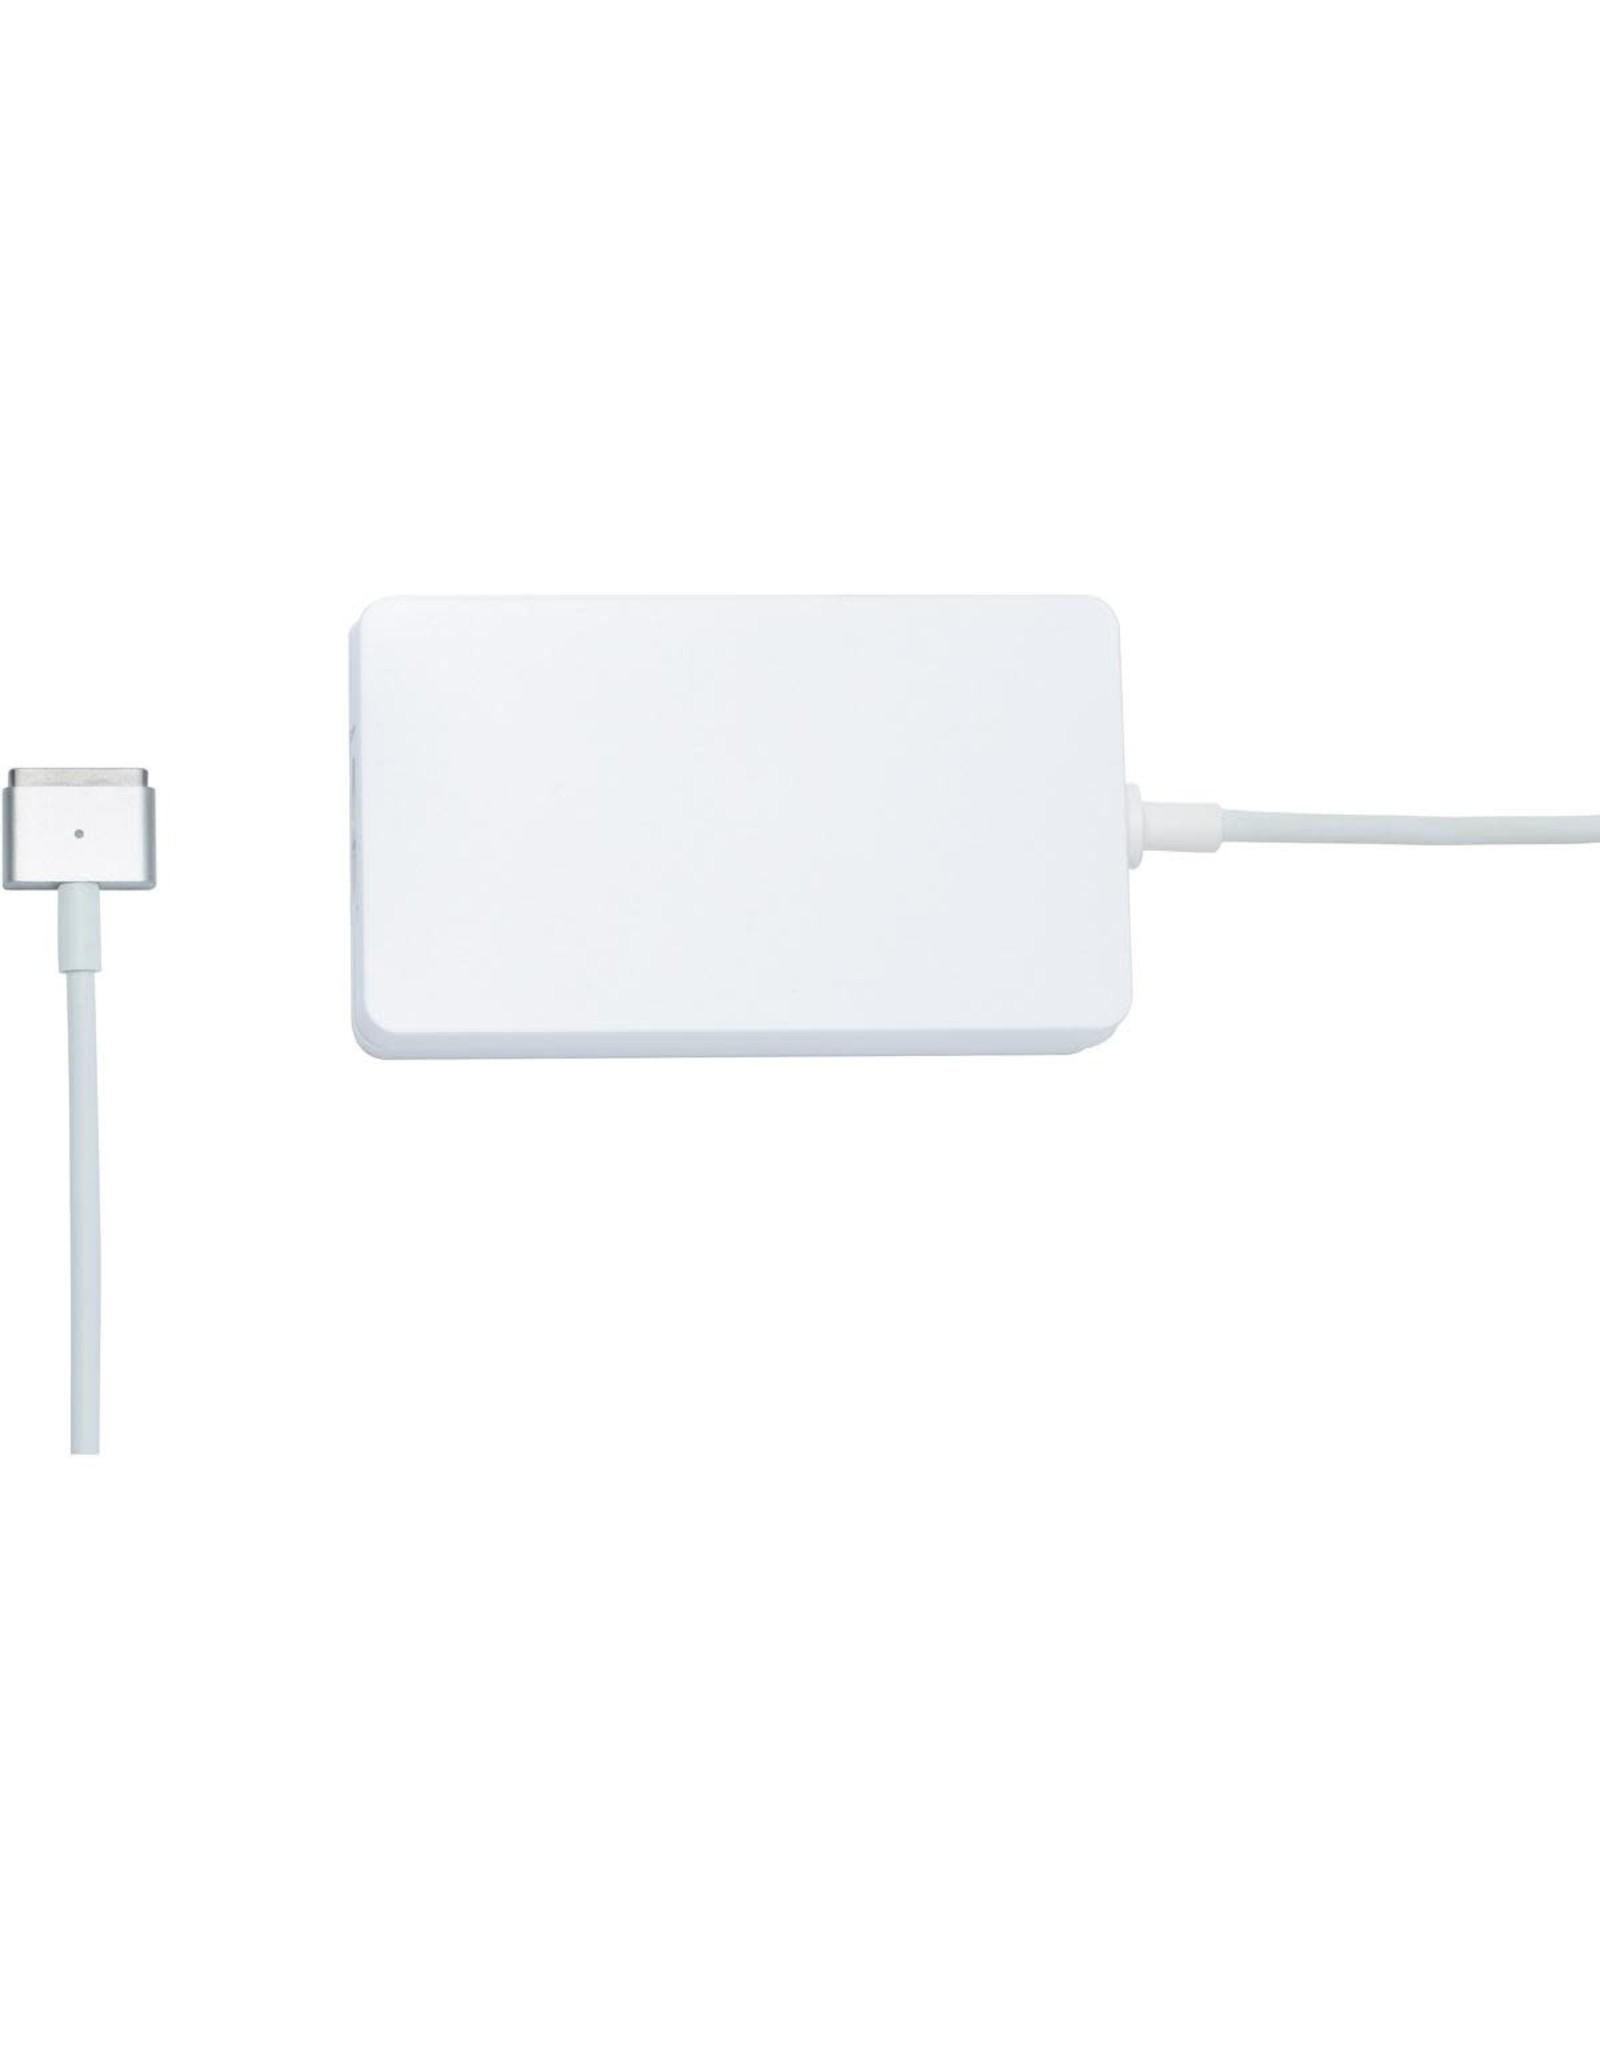 BTI BTI, Power Adapter for Apple MacBook 14.85V 3.05A 45W